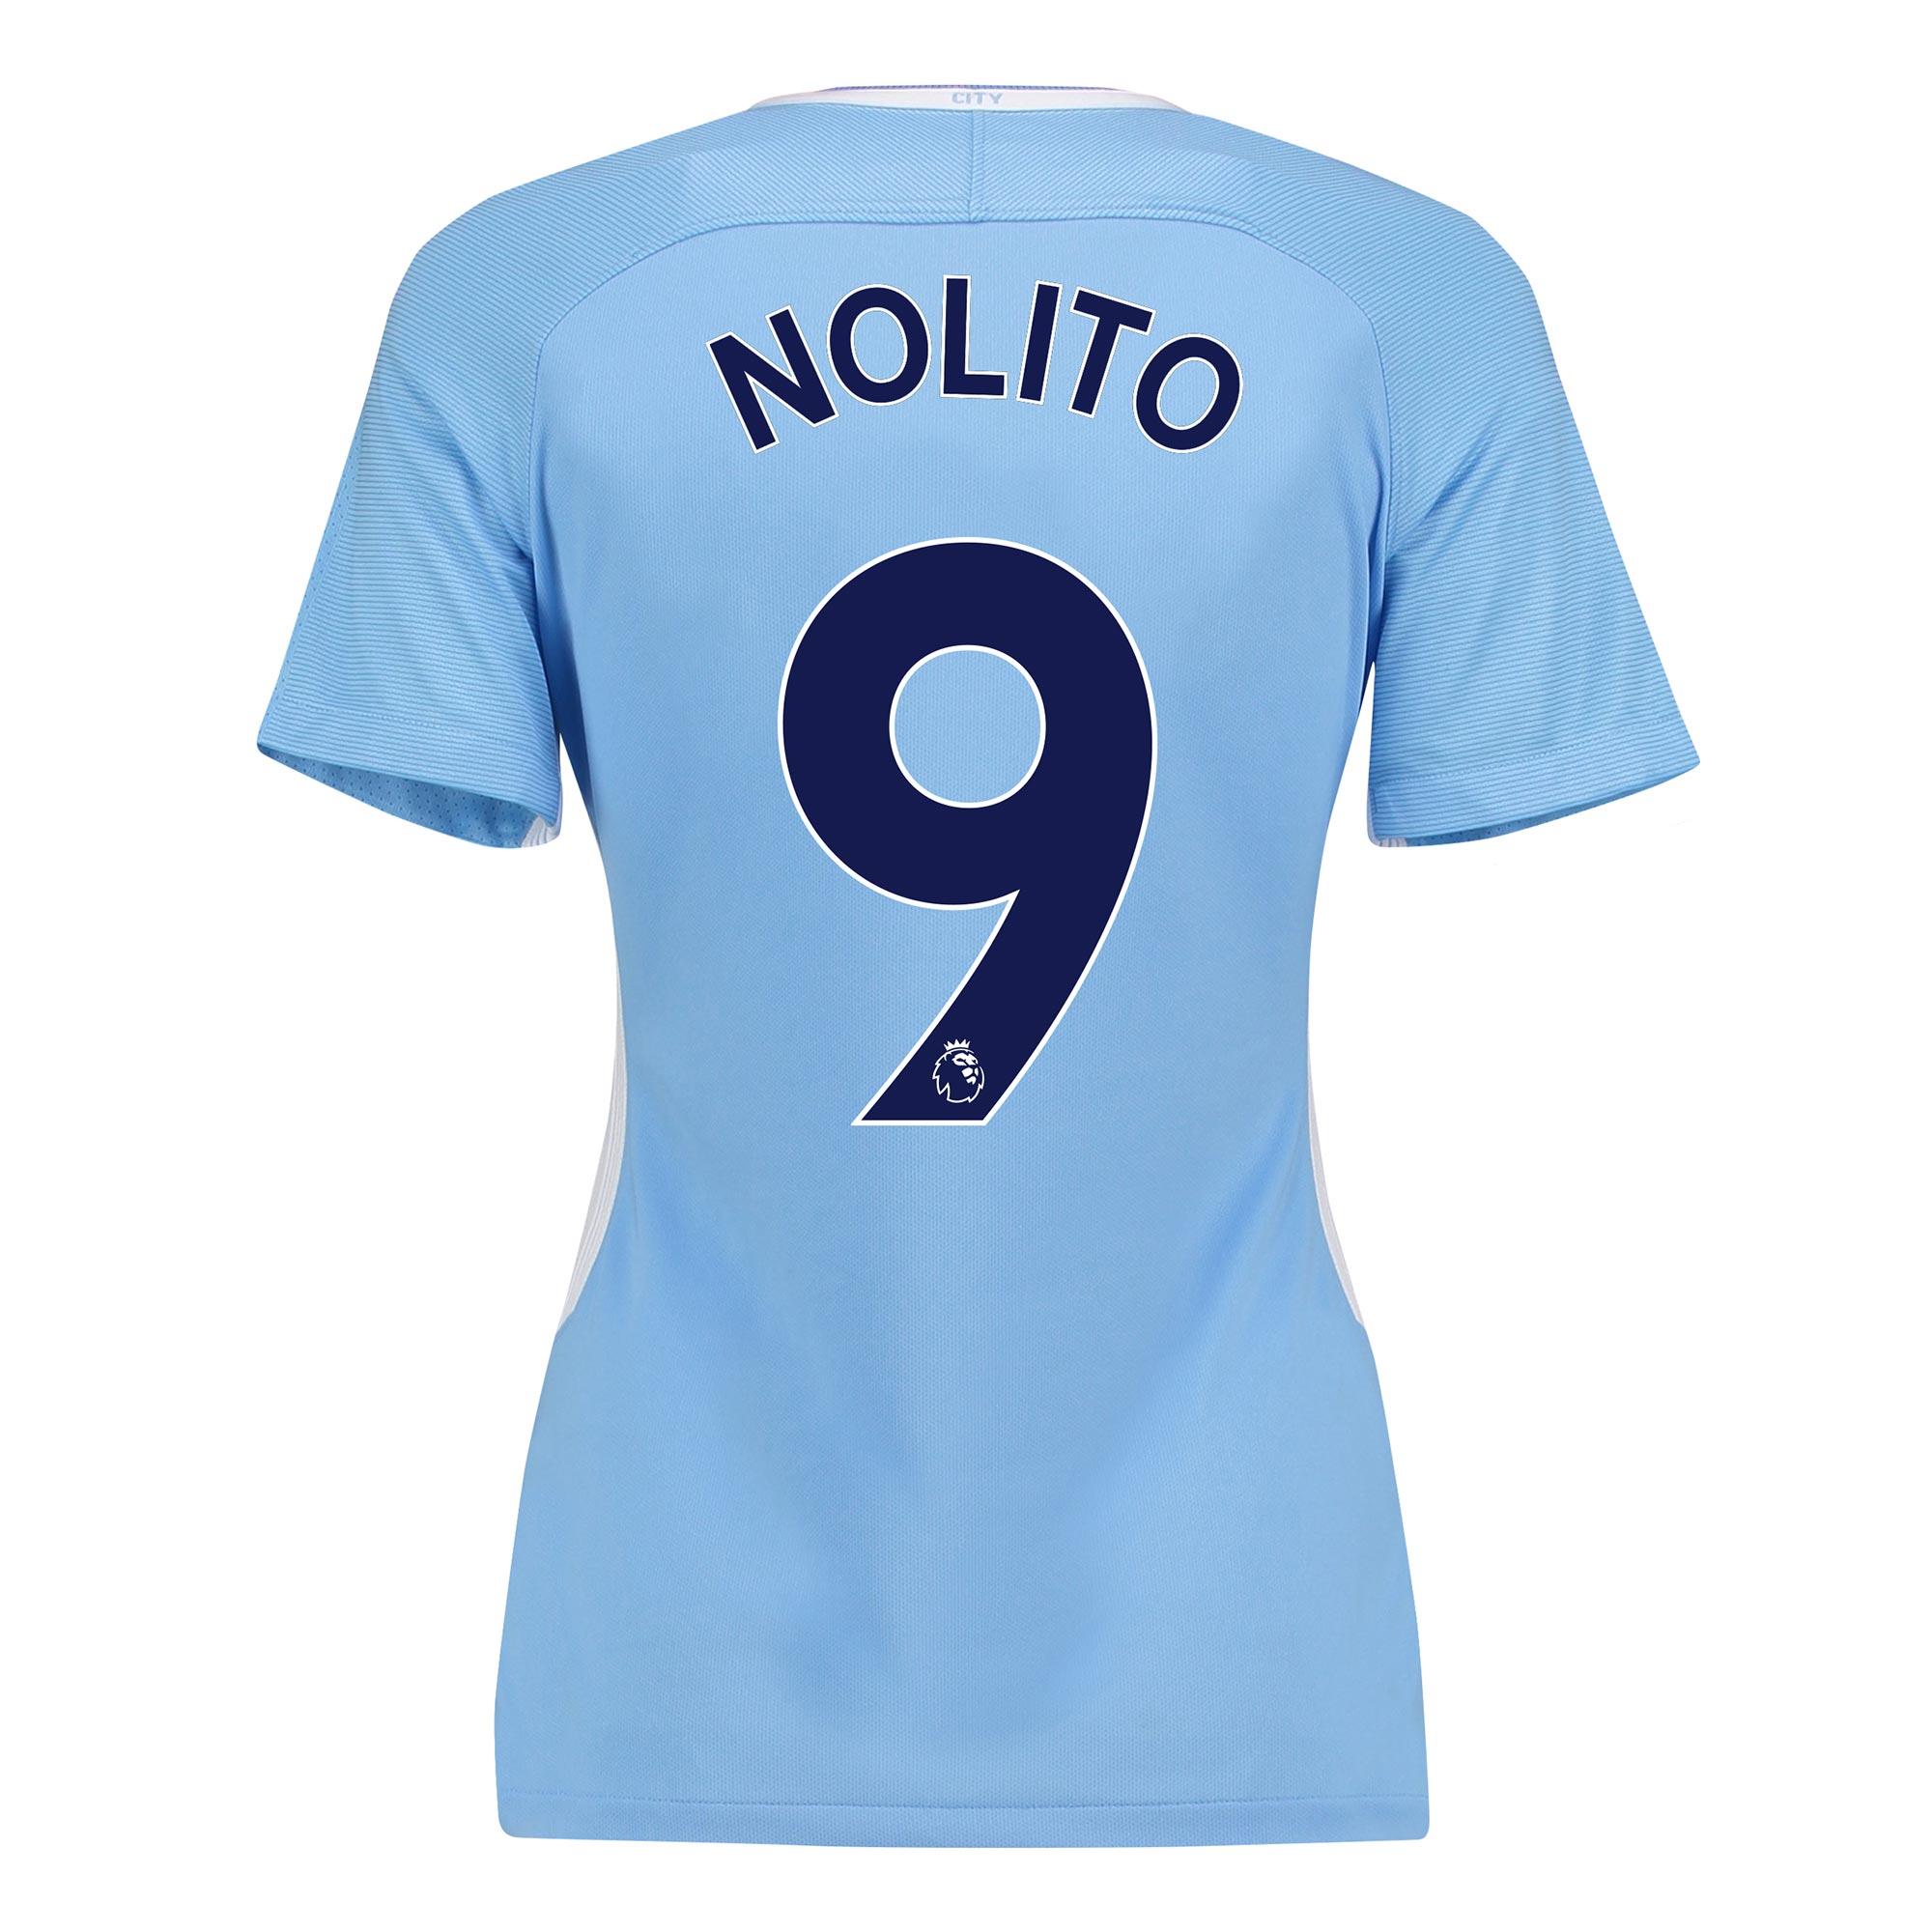 Manchester City Home Stadium Shirt 2017-18 - Womens with Nolito 9 prin